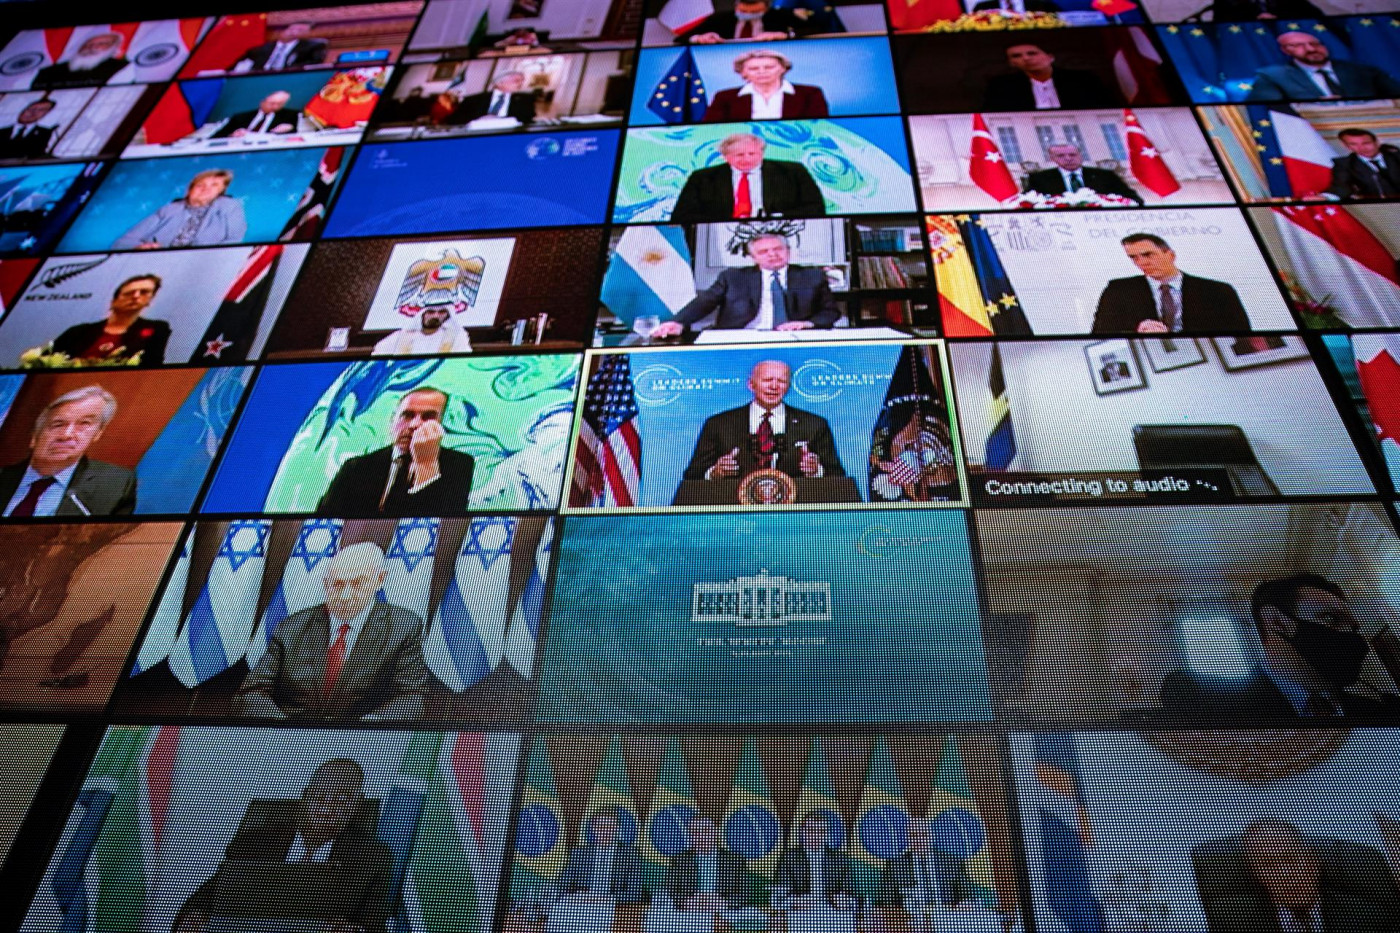 Cerca de 40 países participam da Cúpula de Líderes do Clima organizado pelos Estados Unidos